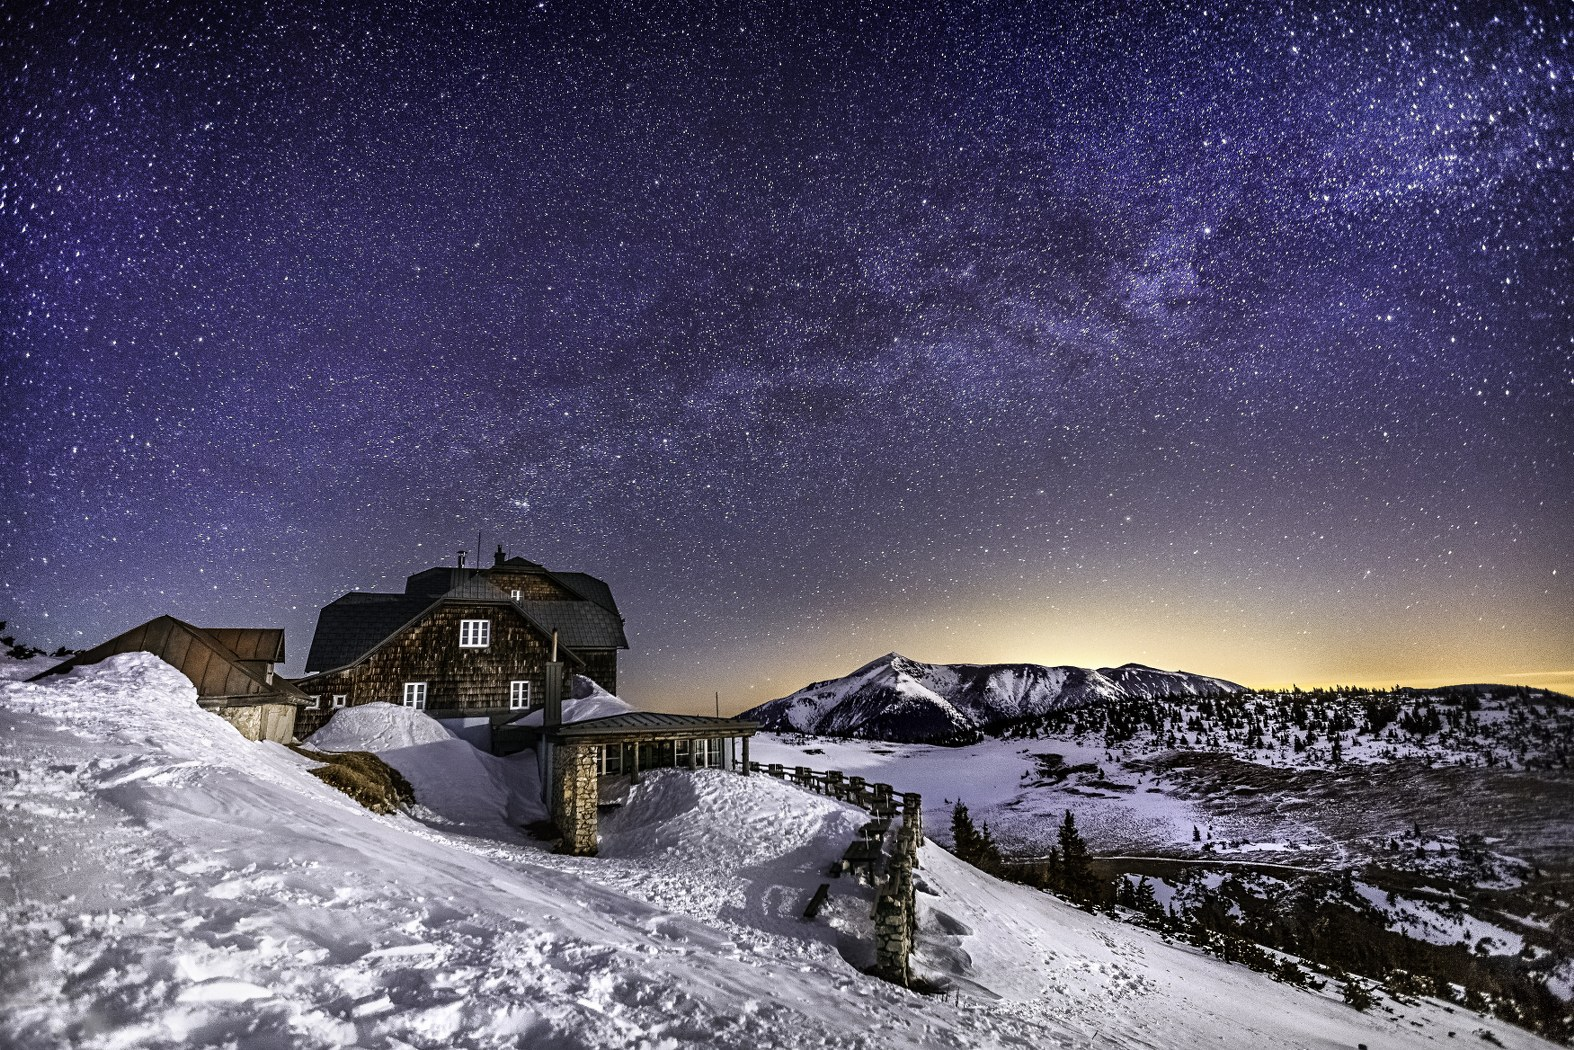 Rax; (c) Wiener Alpen, Christian Kremsl